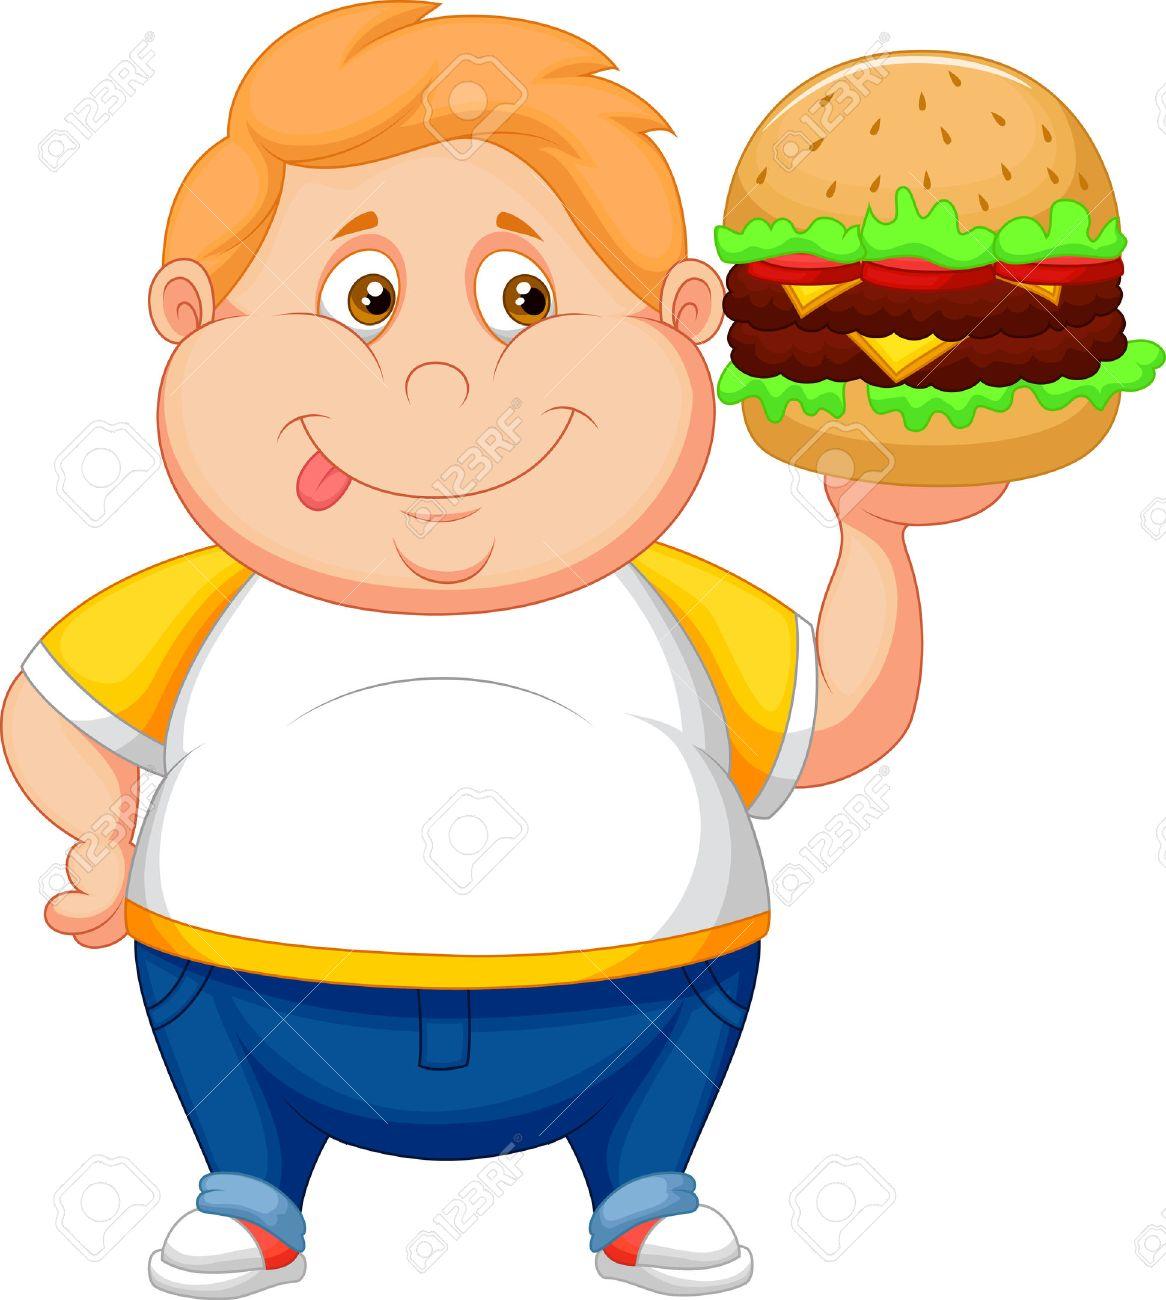 Znalezione obrazy dla zapytania: apetyt gif